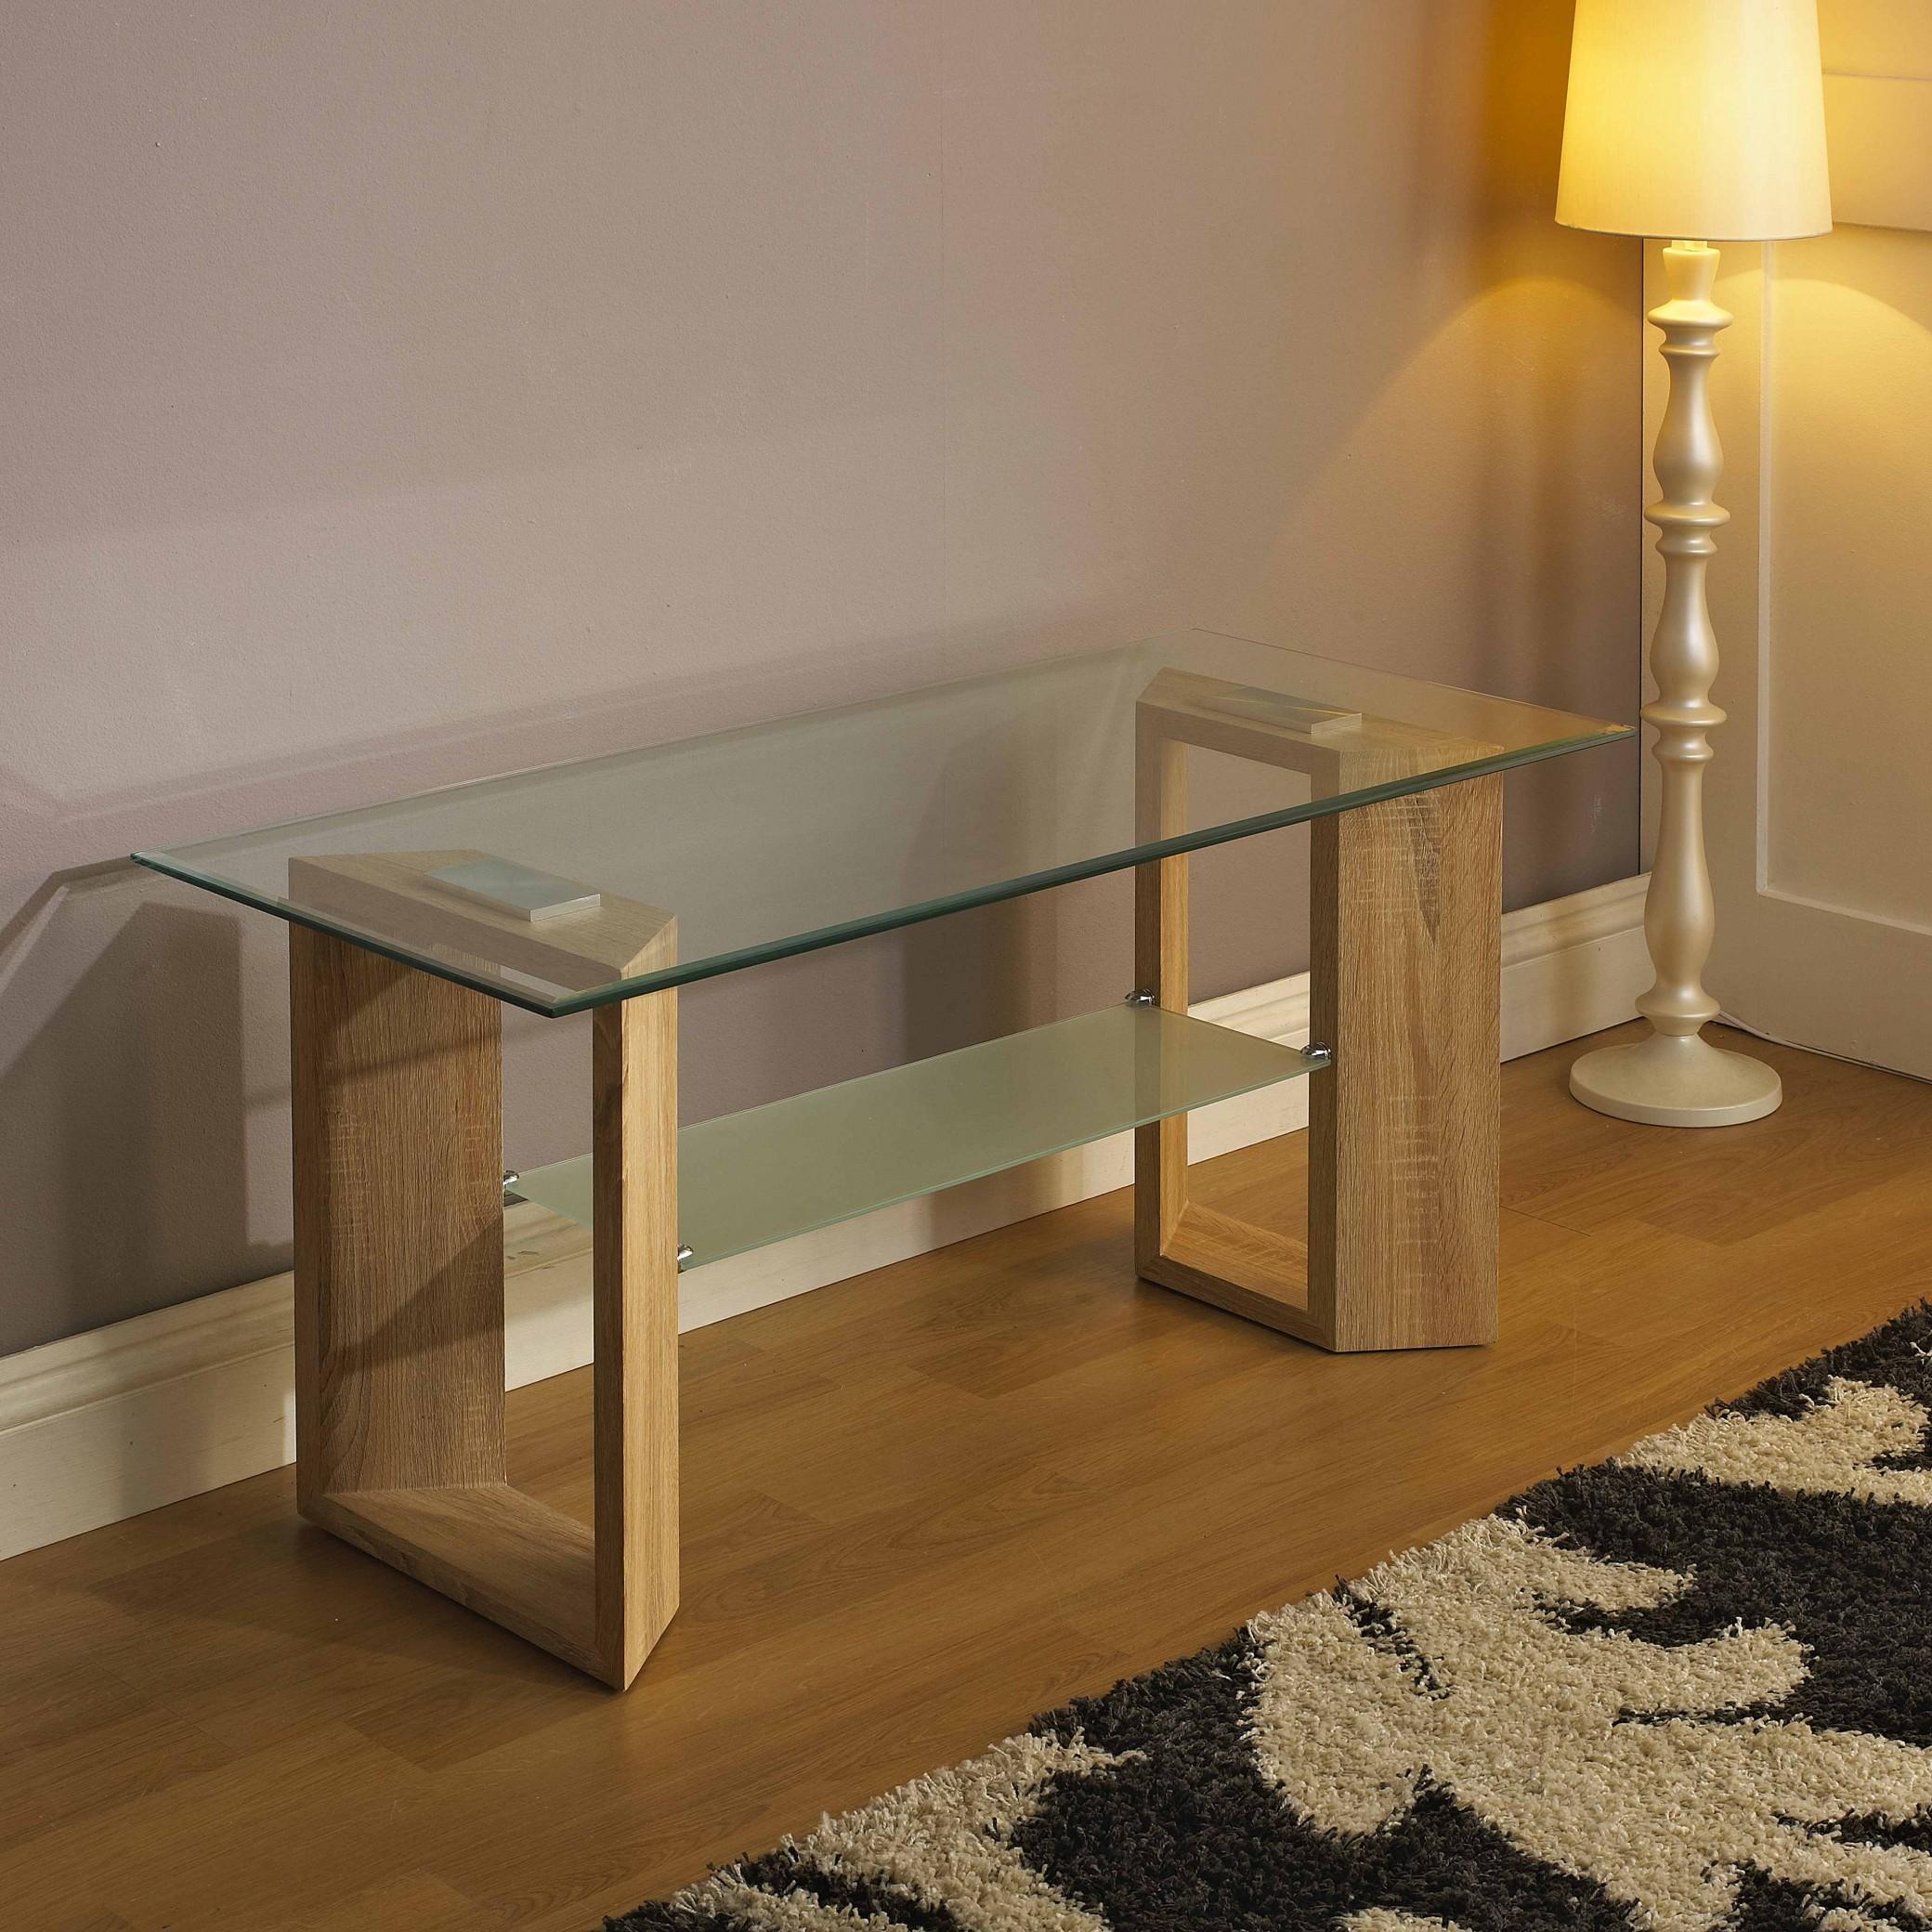 midland furniture pany